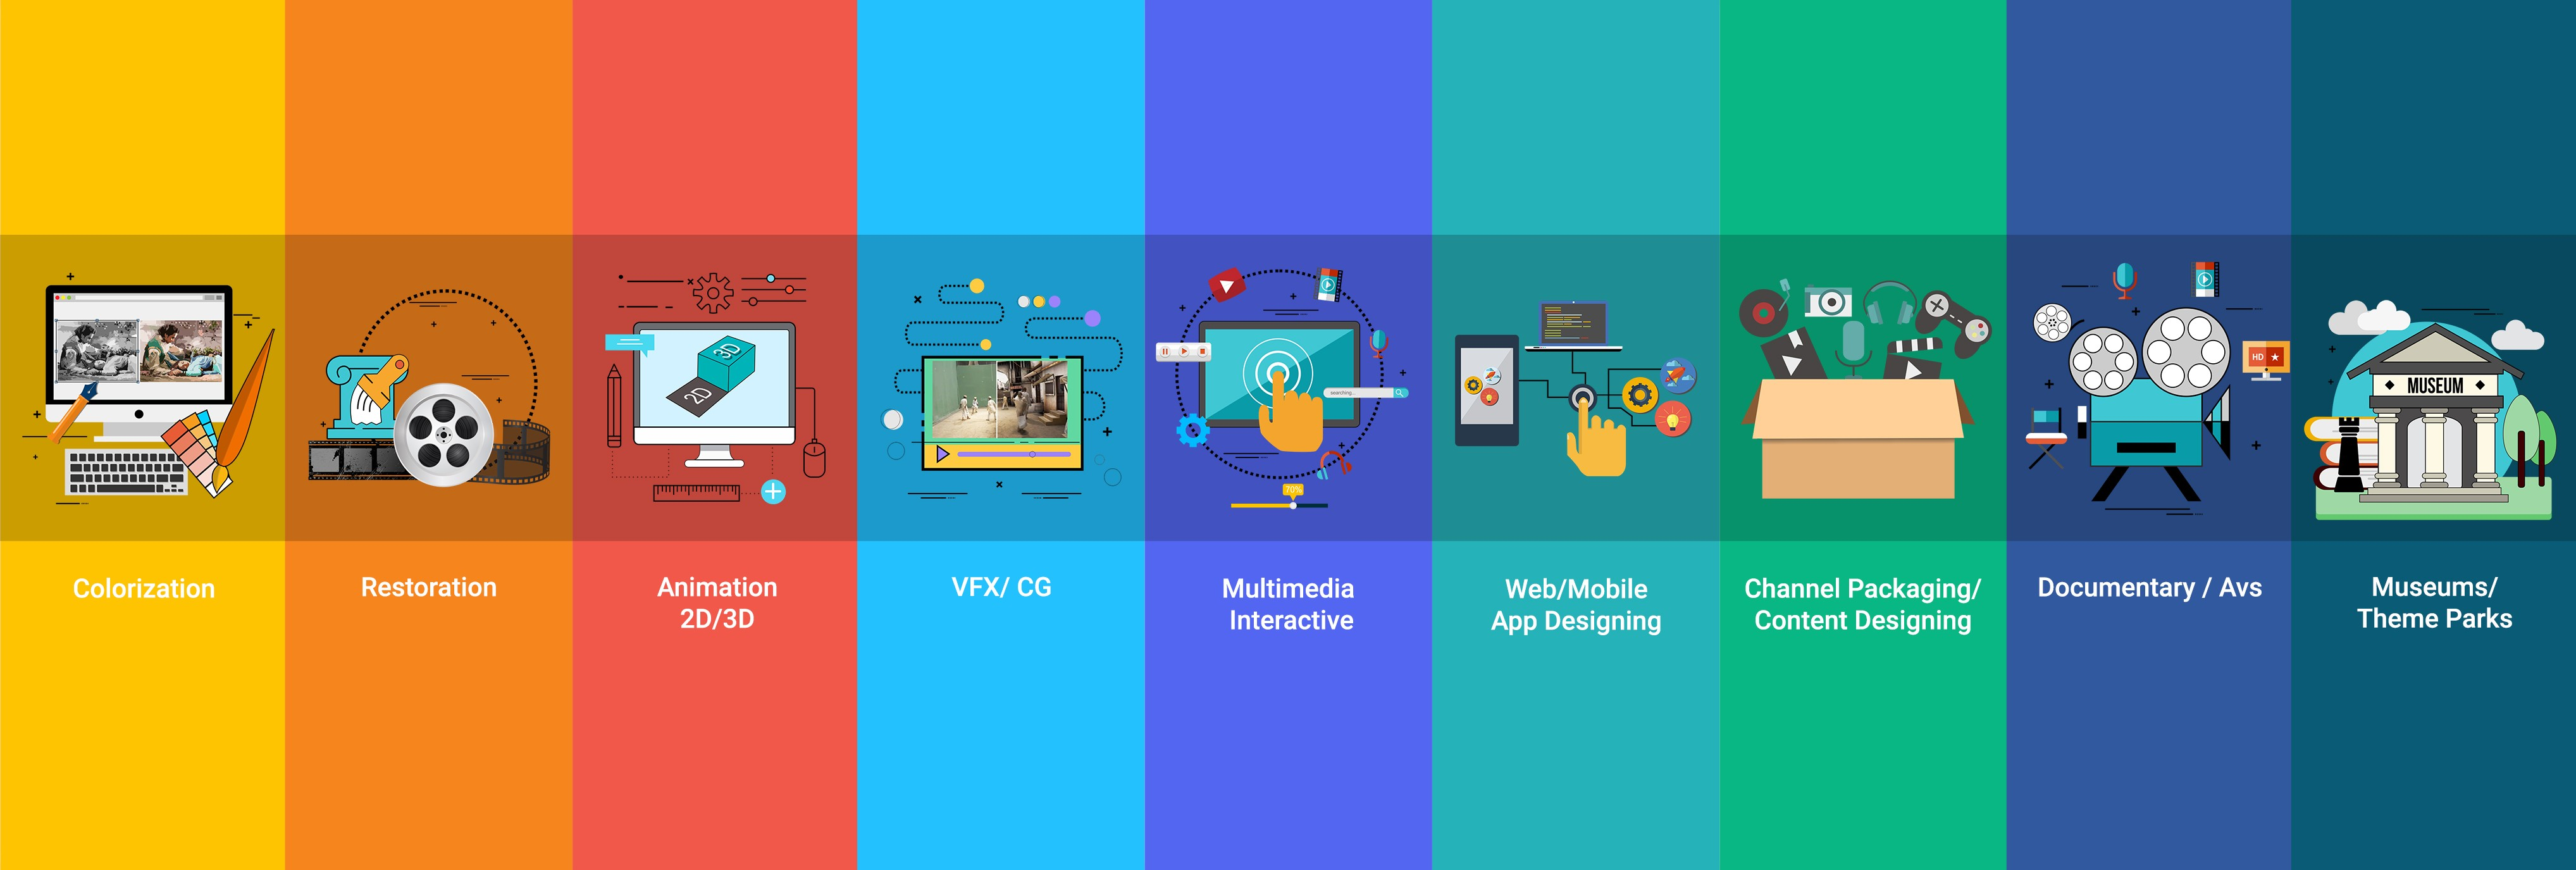 LivePixel Technologies | LinkedIn